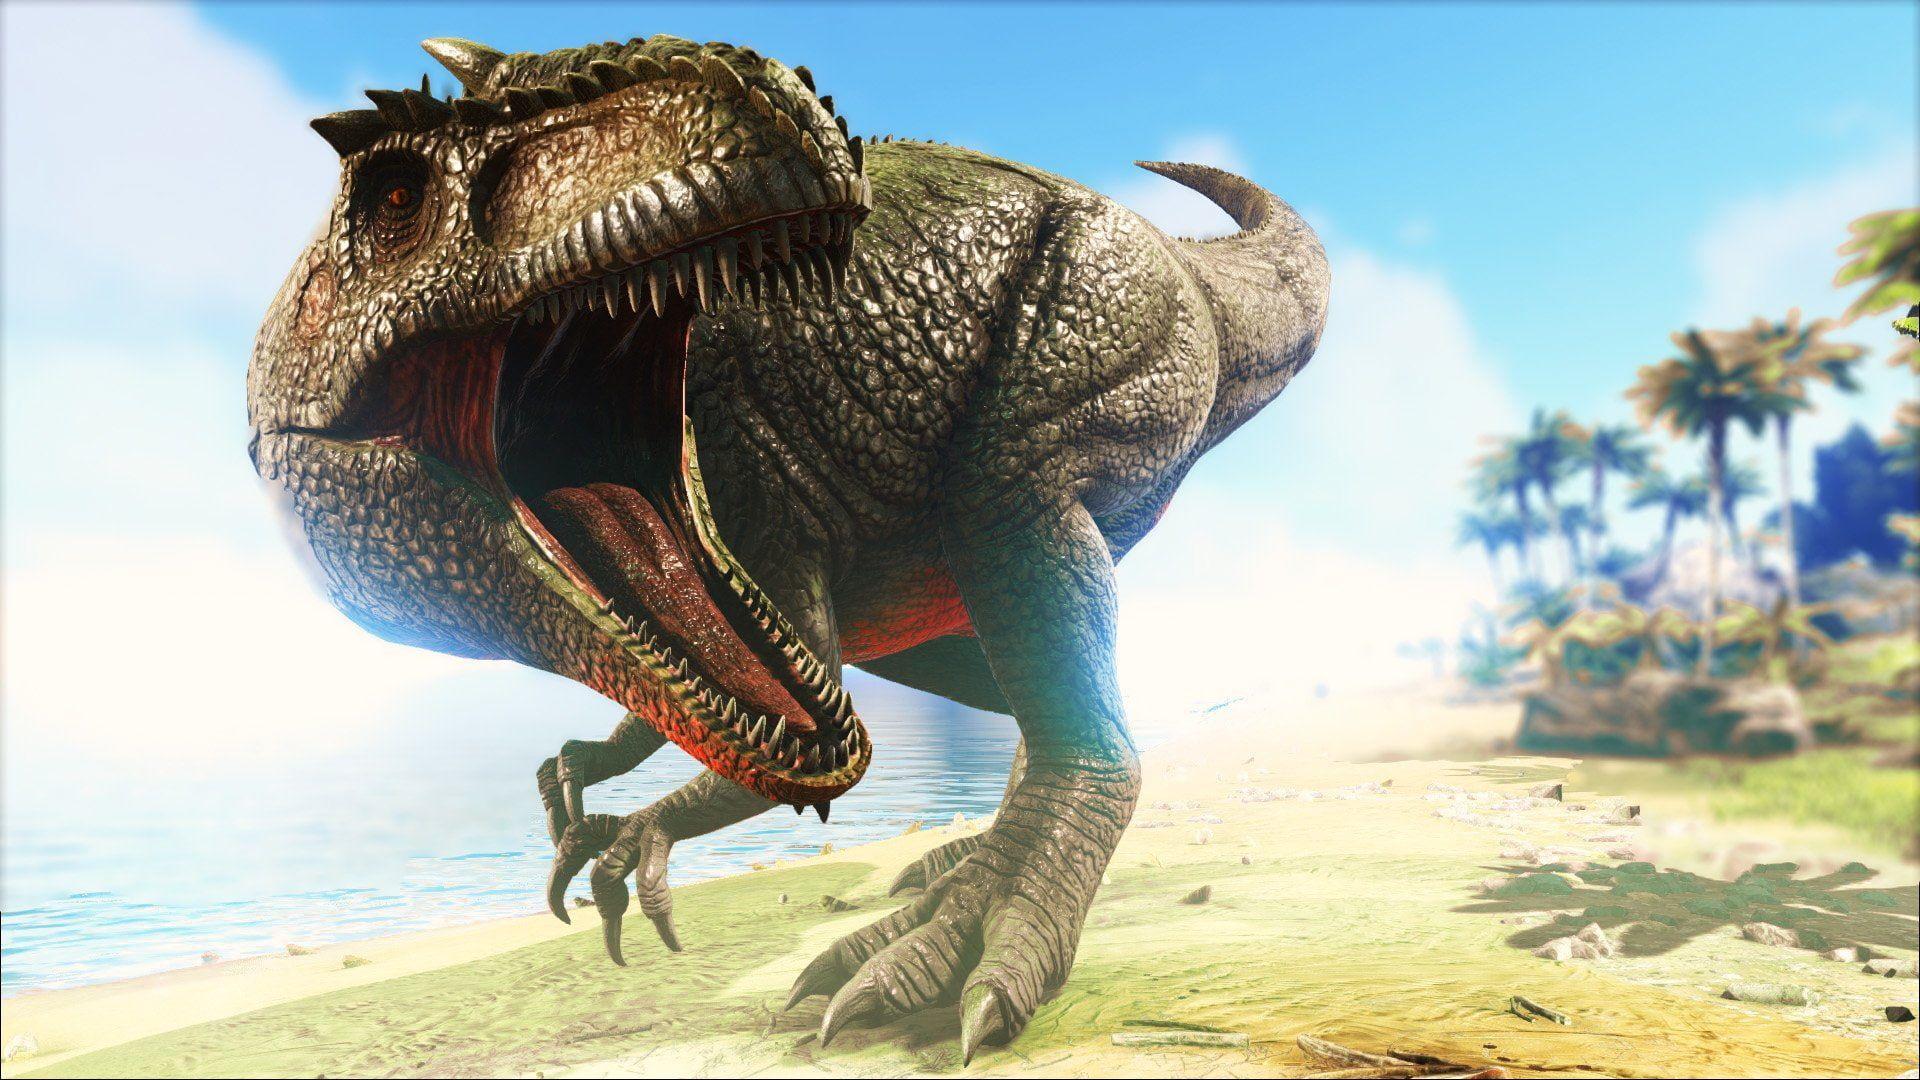 Save 67 On Ark Survival Evolved On Steam Ark Survival Evolved Evolve Wallpapers Game Ark Survival Evolved